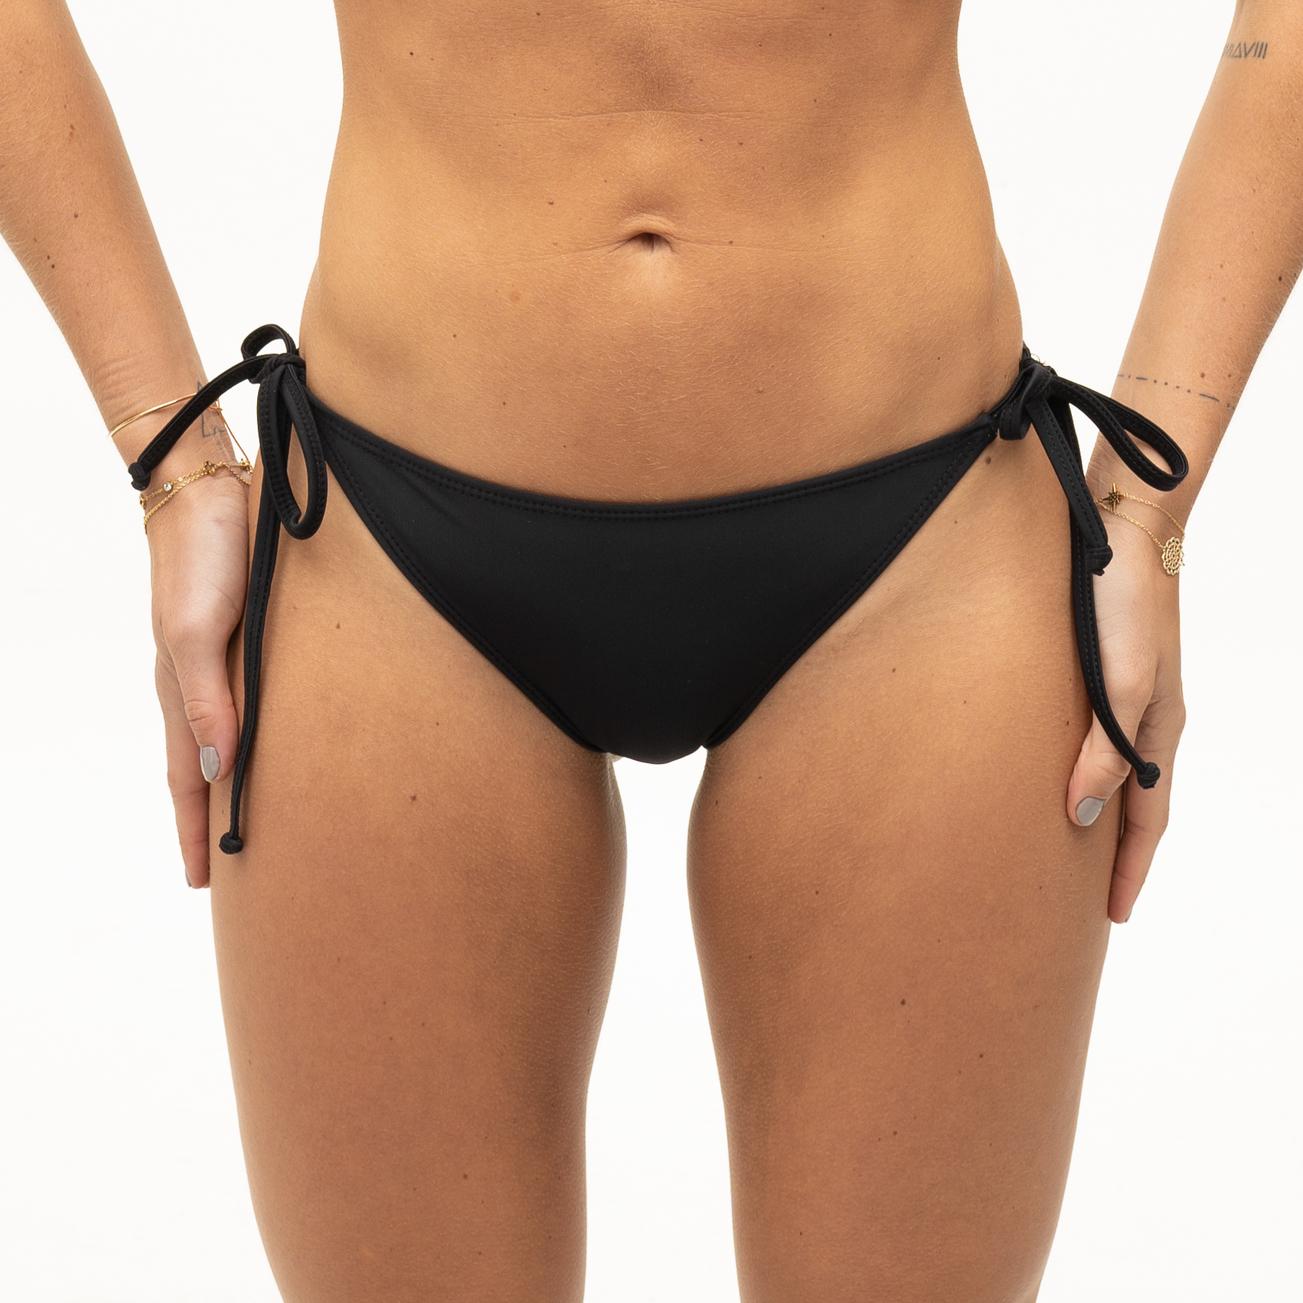 Black bikini bottoms with bows